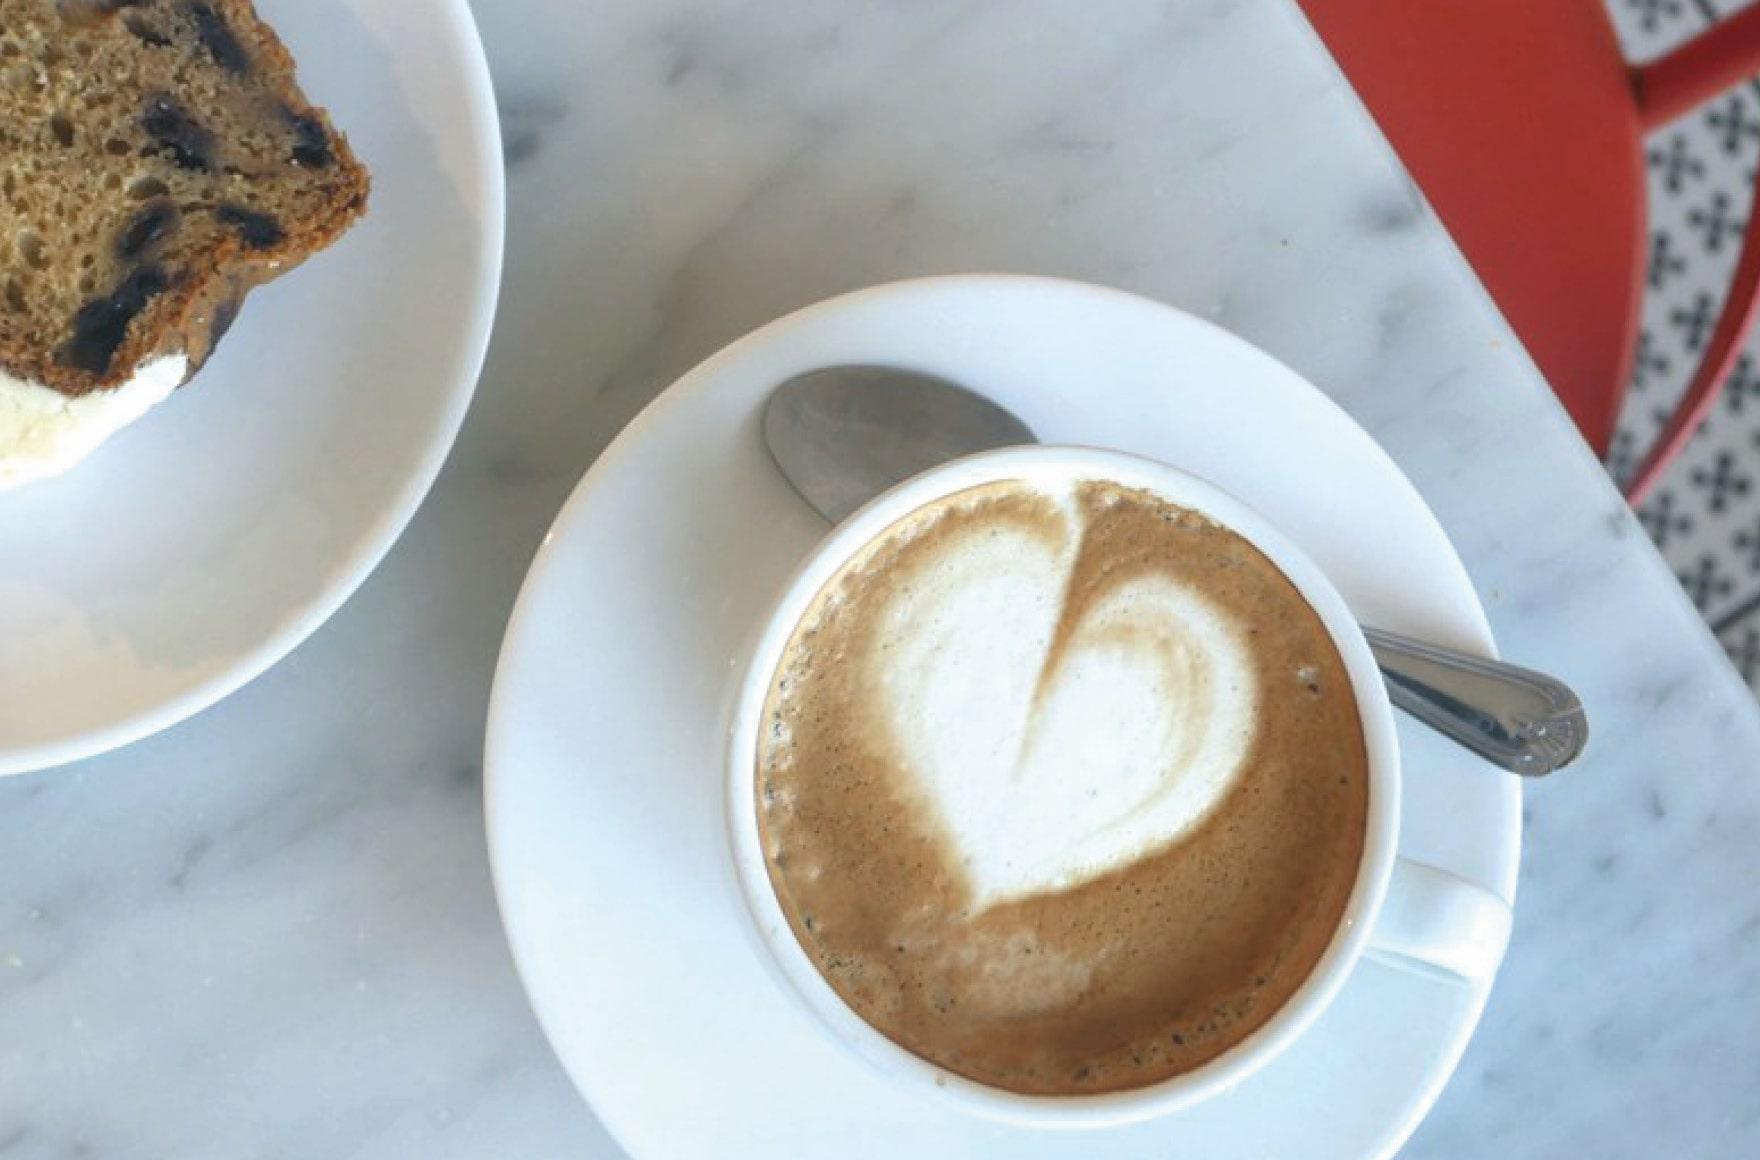 Coffee and Cake at Restoration Yard